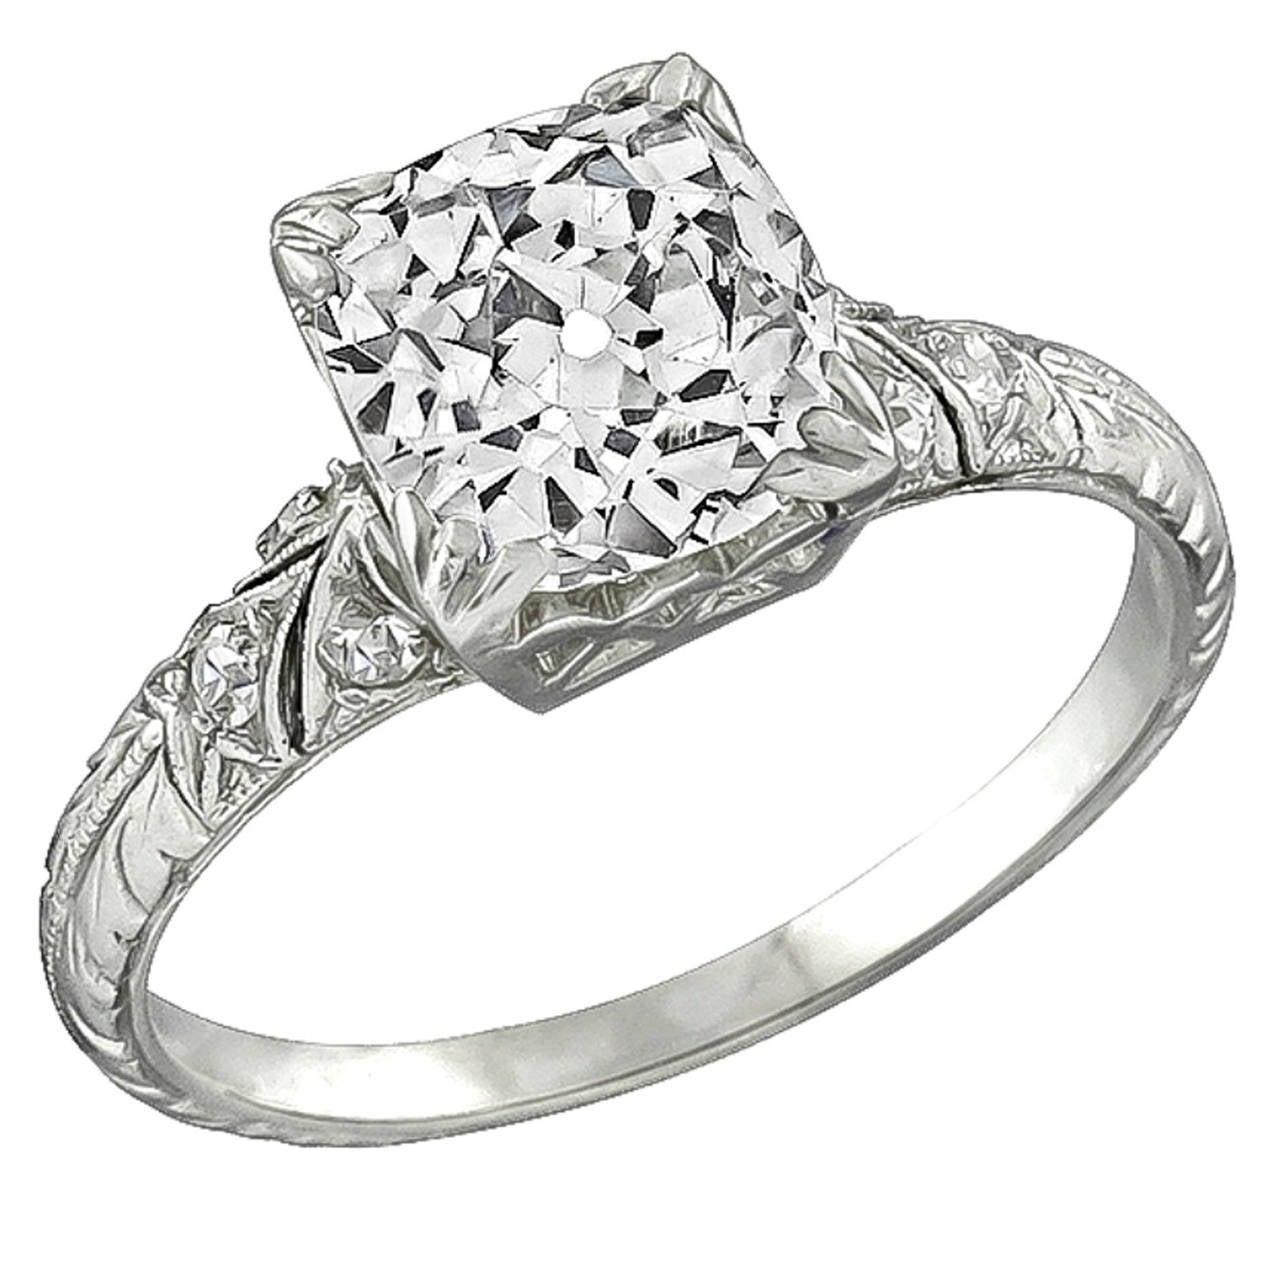 2.05 Carat Cushion Cut Diamond Platinum Engagement Ring